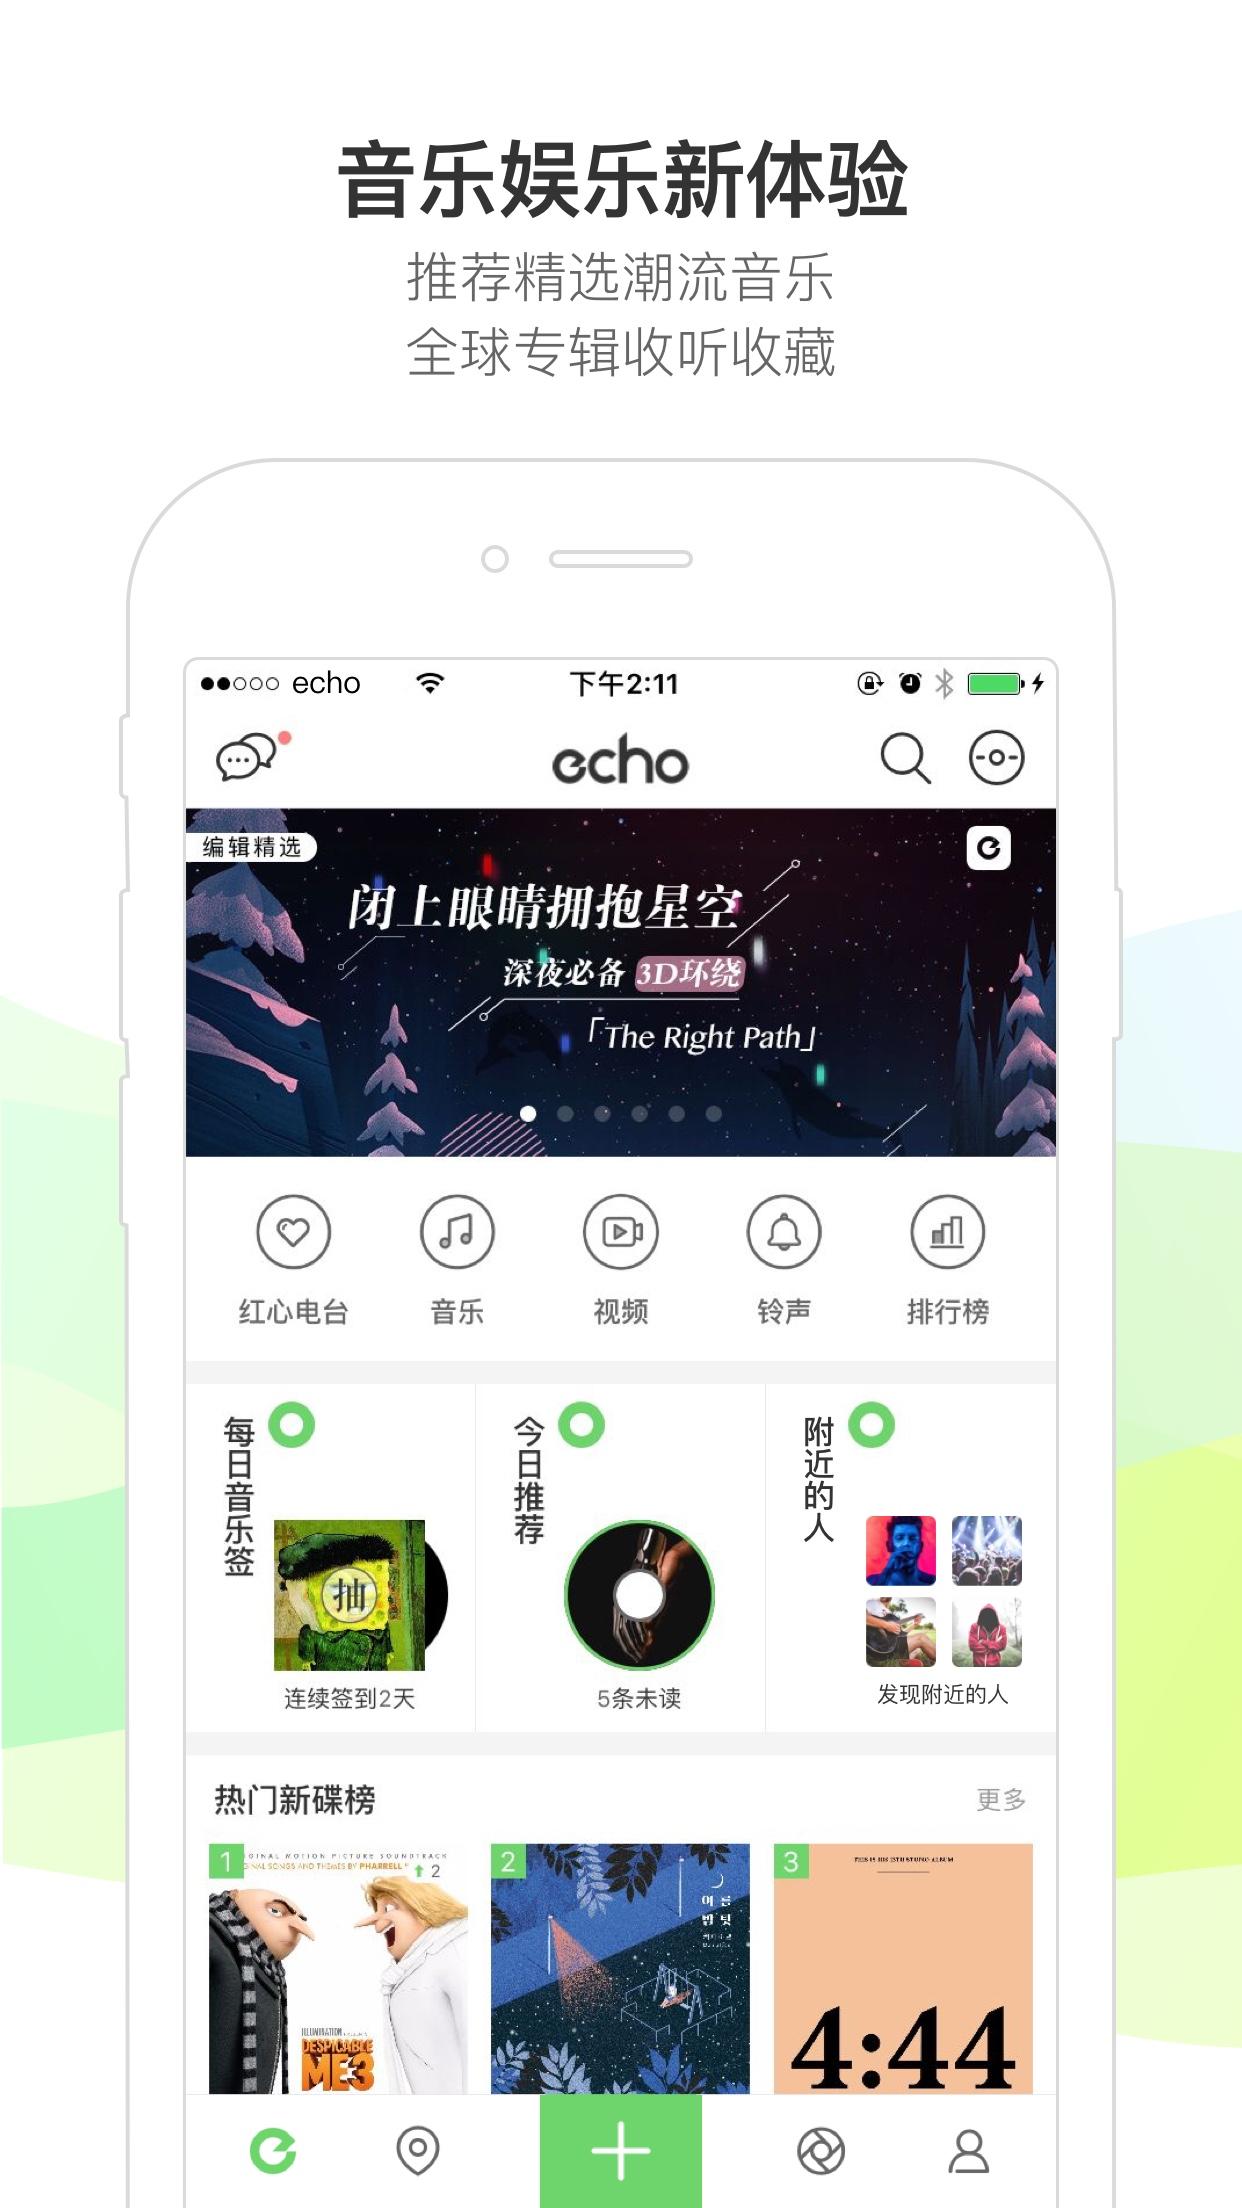 echo回声-应用截图